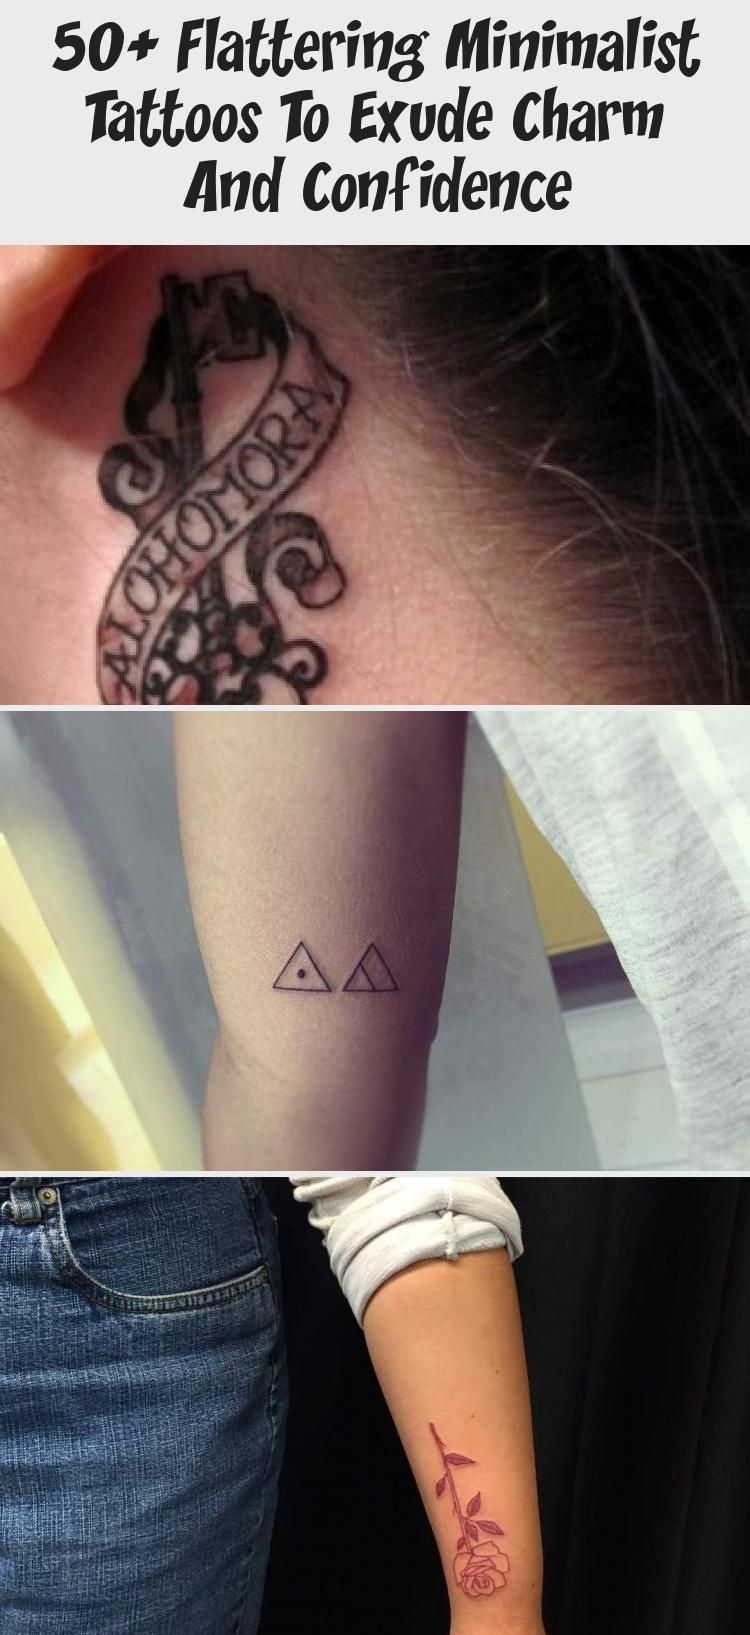 Flattering Minimalist Tattoos